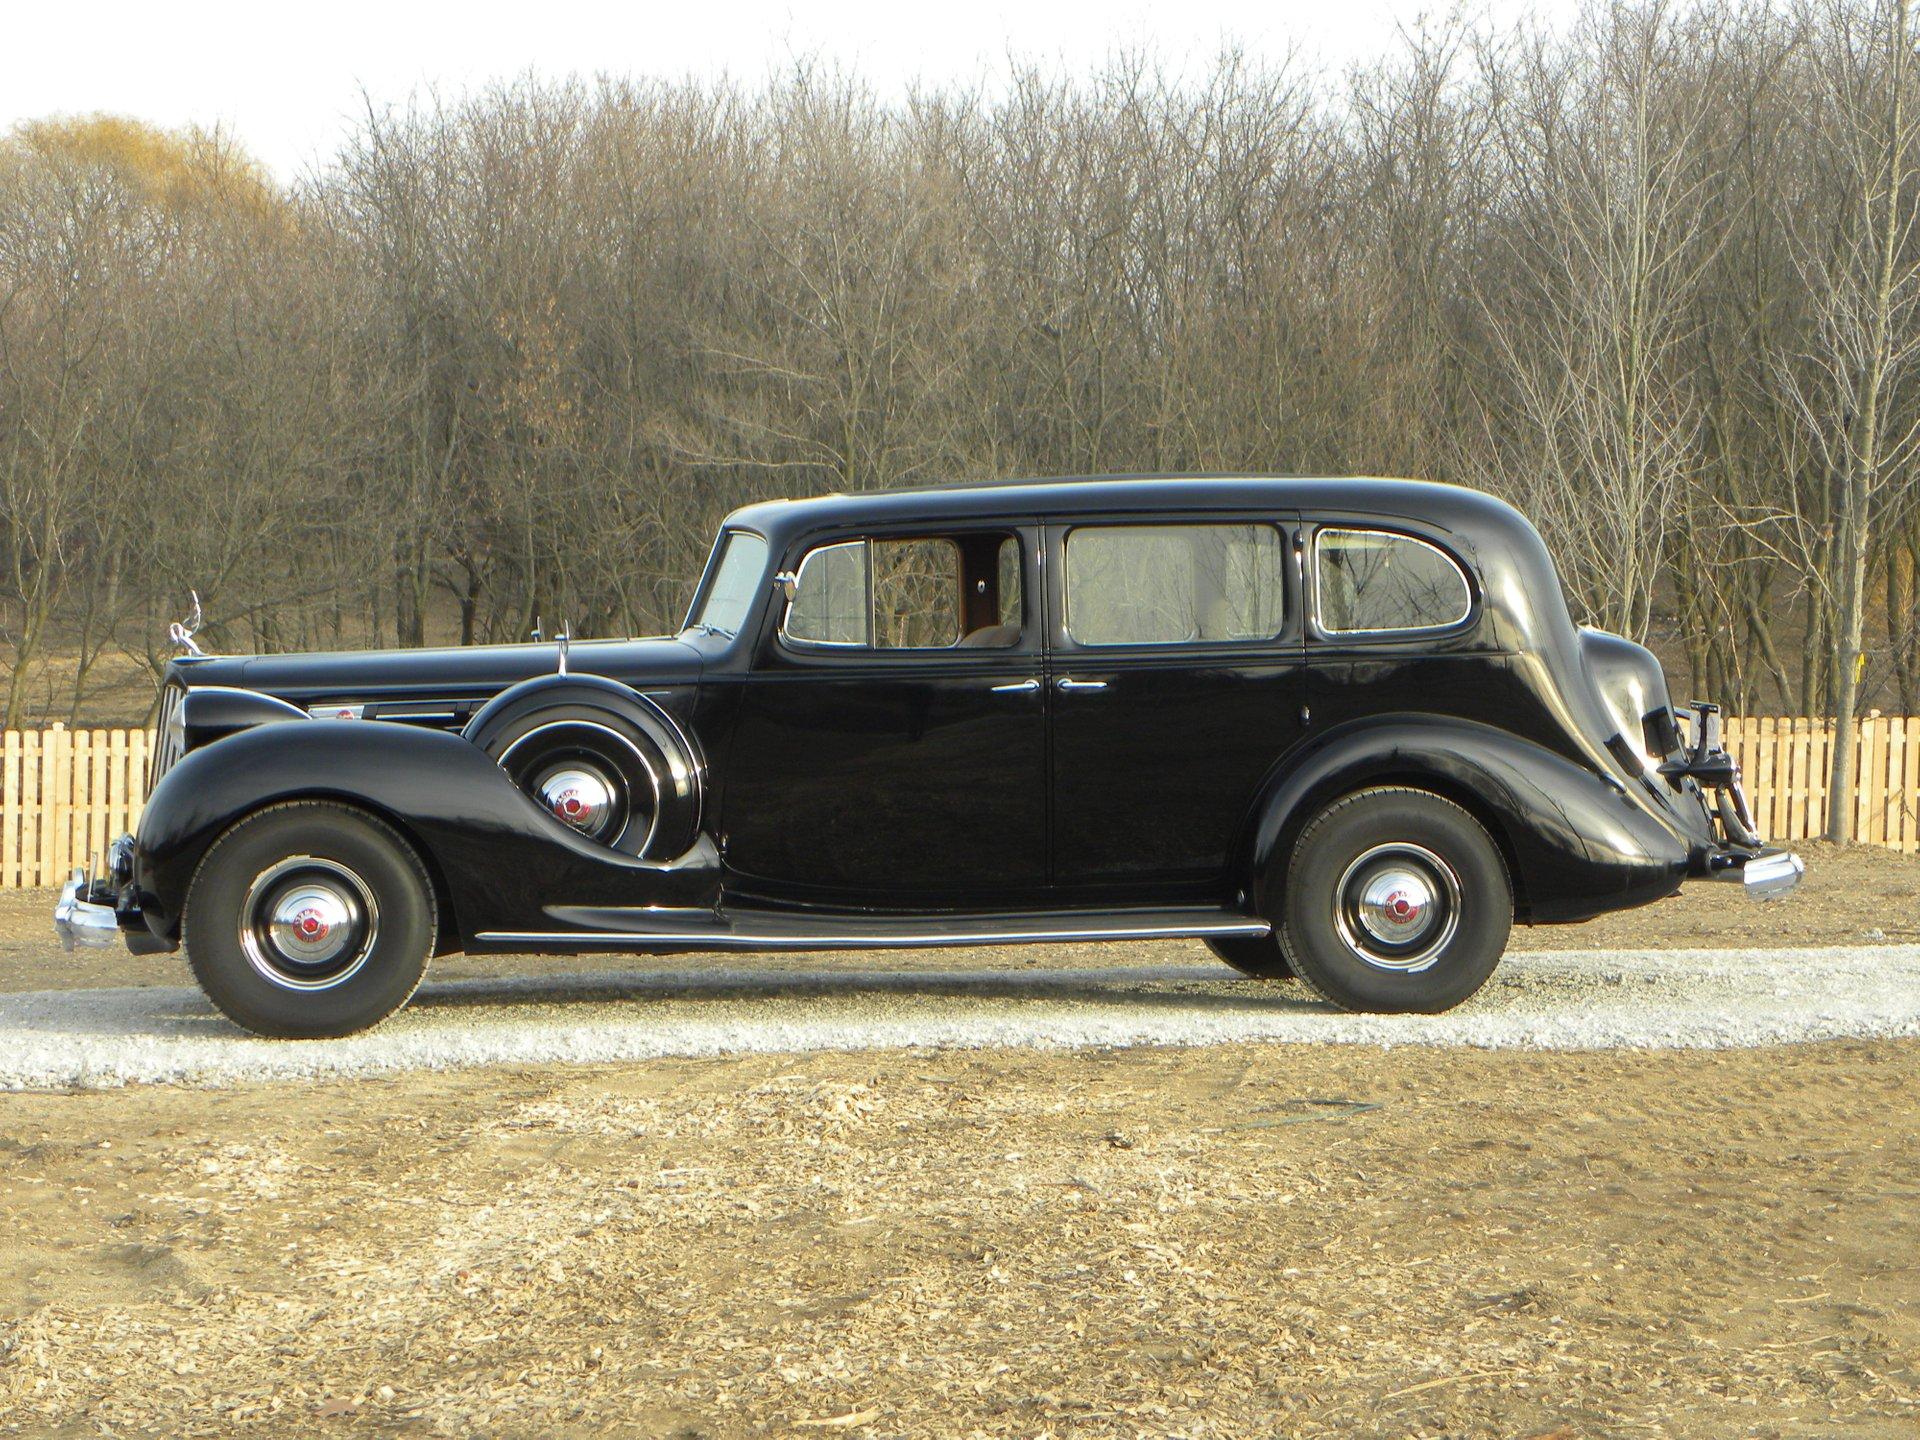 1939 packard 1708 7 passenger formal sedan